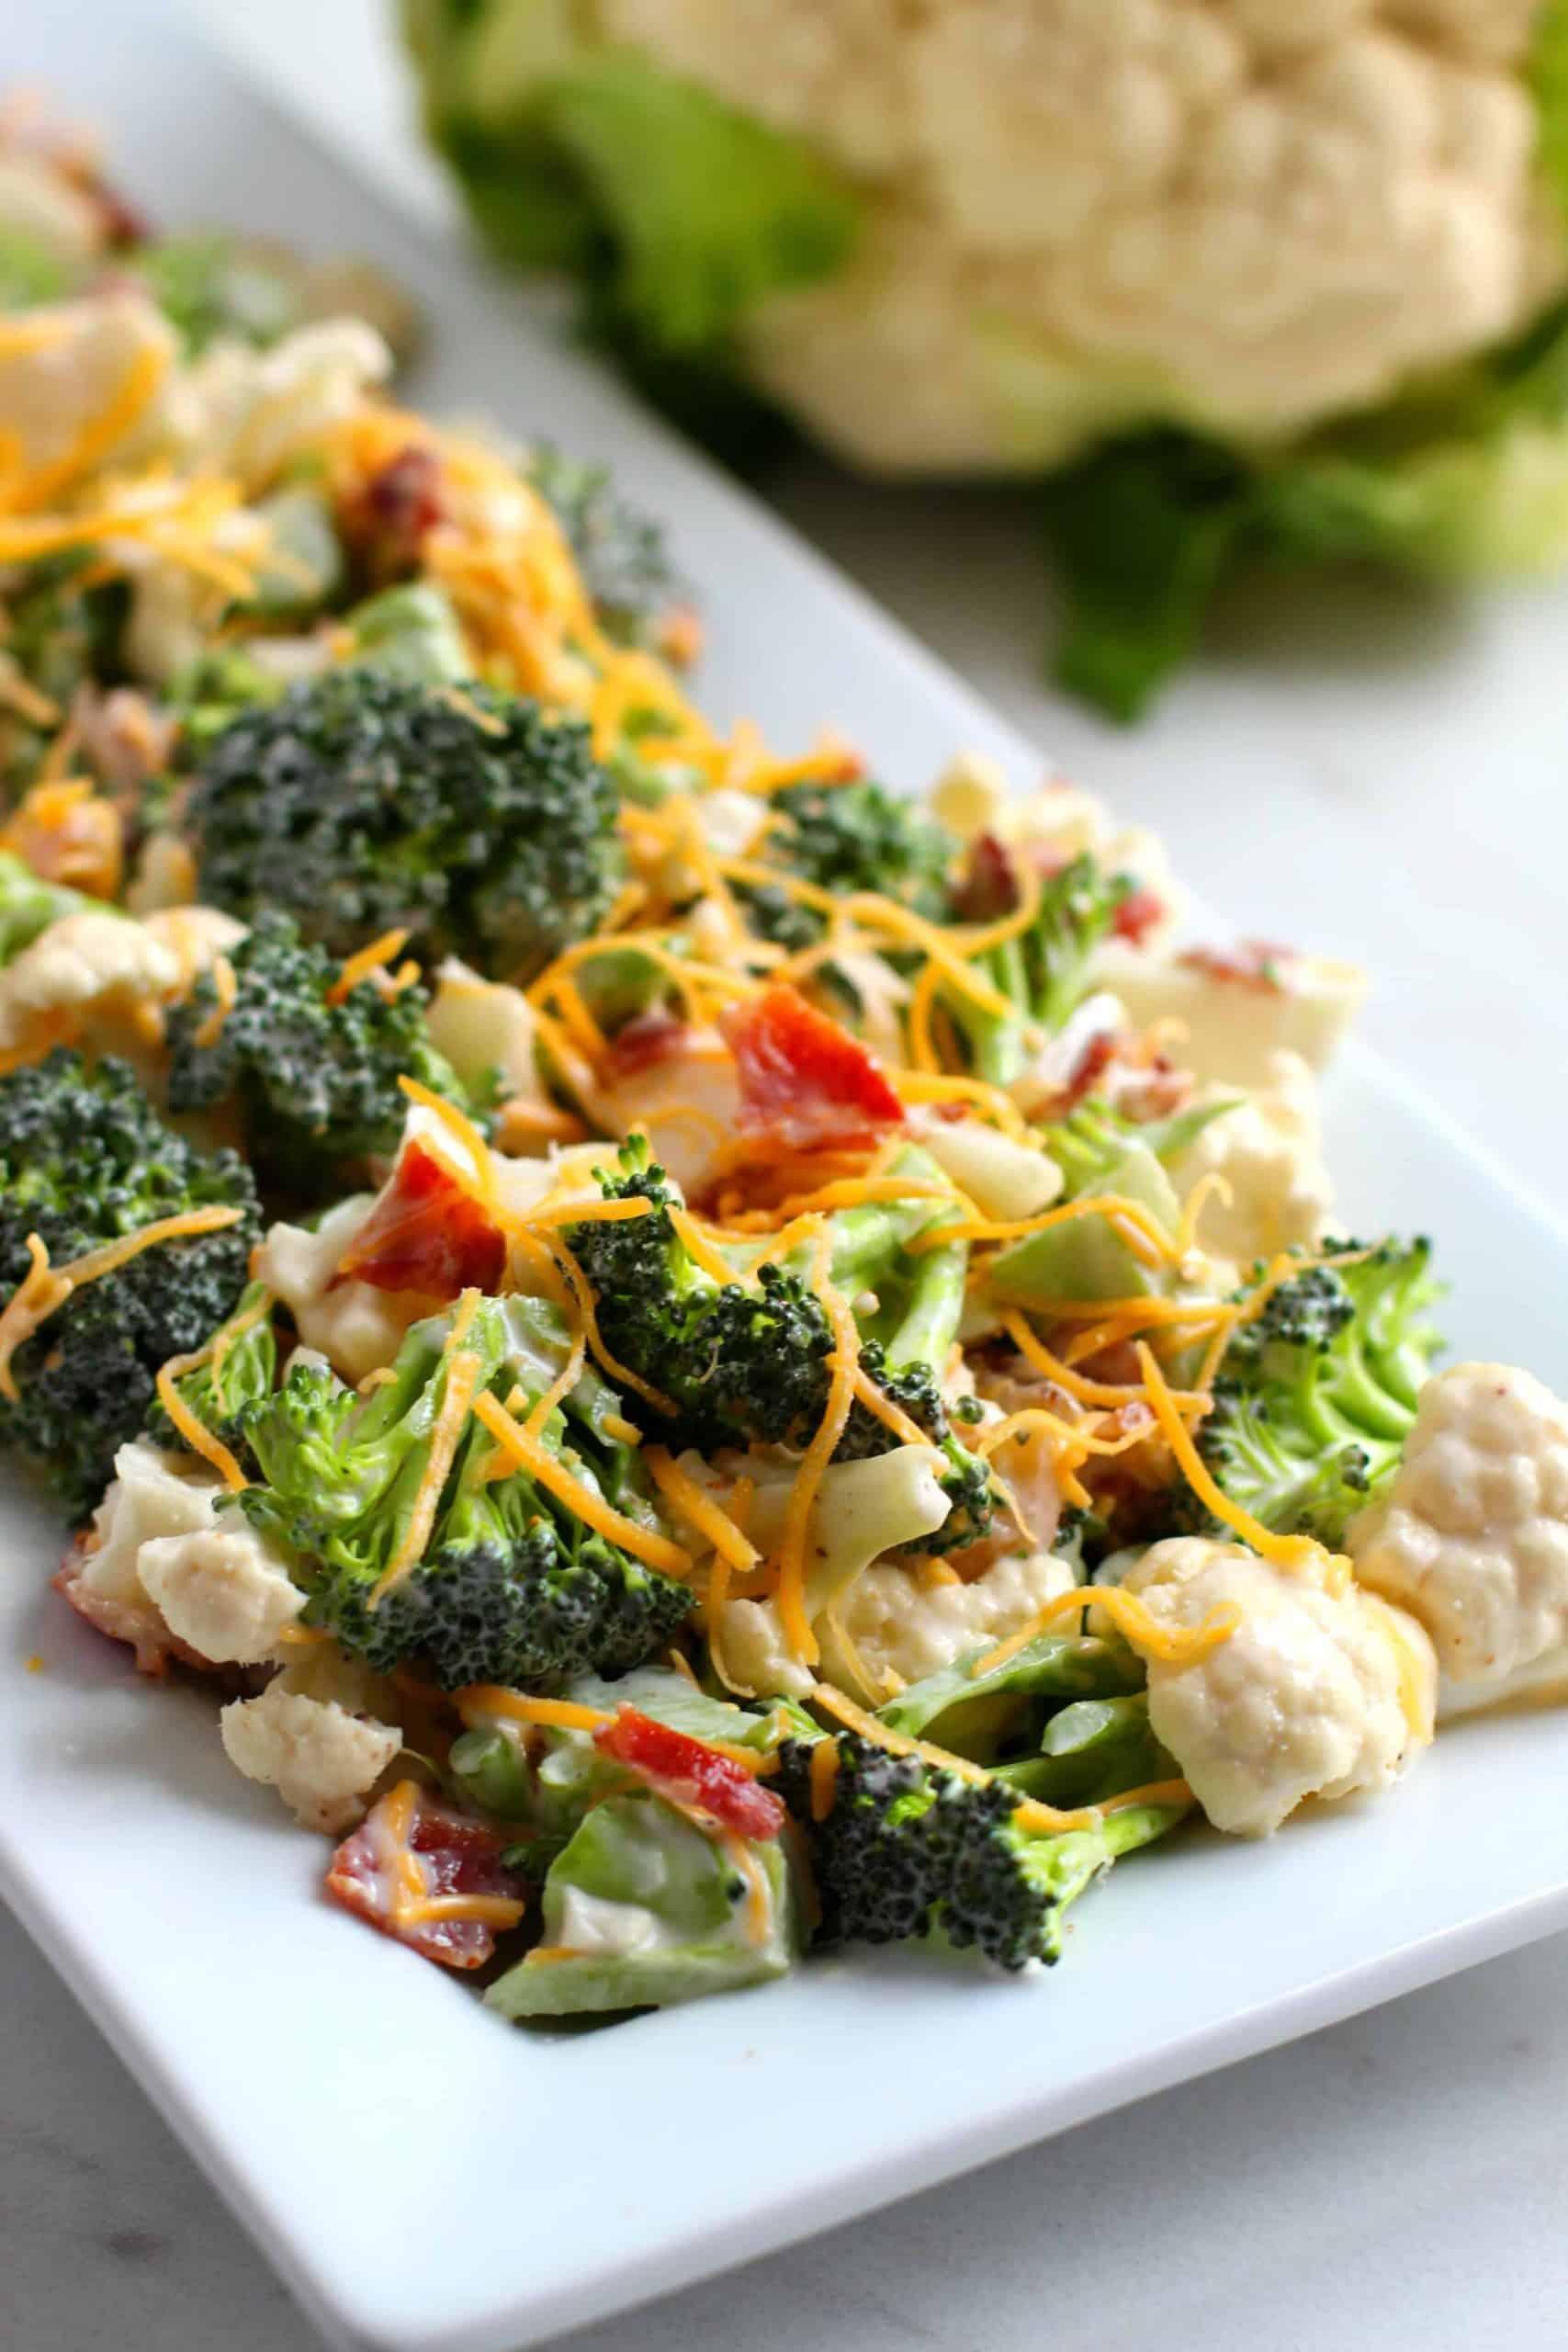 Low Carb Broccoli Cauliflower Salad Southern Plate